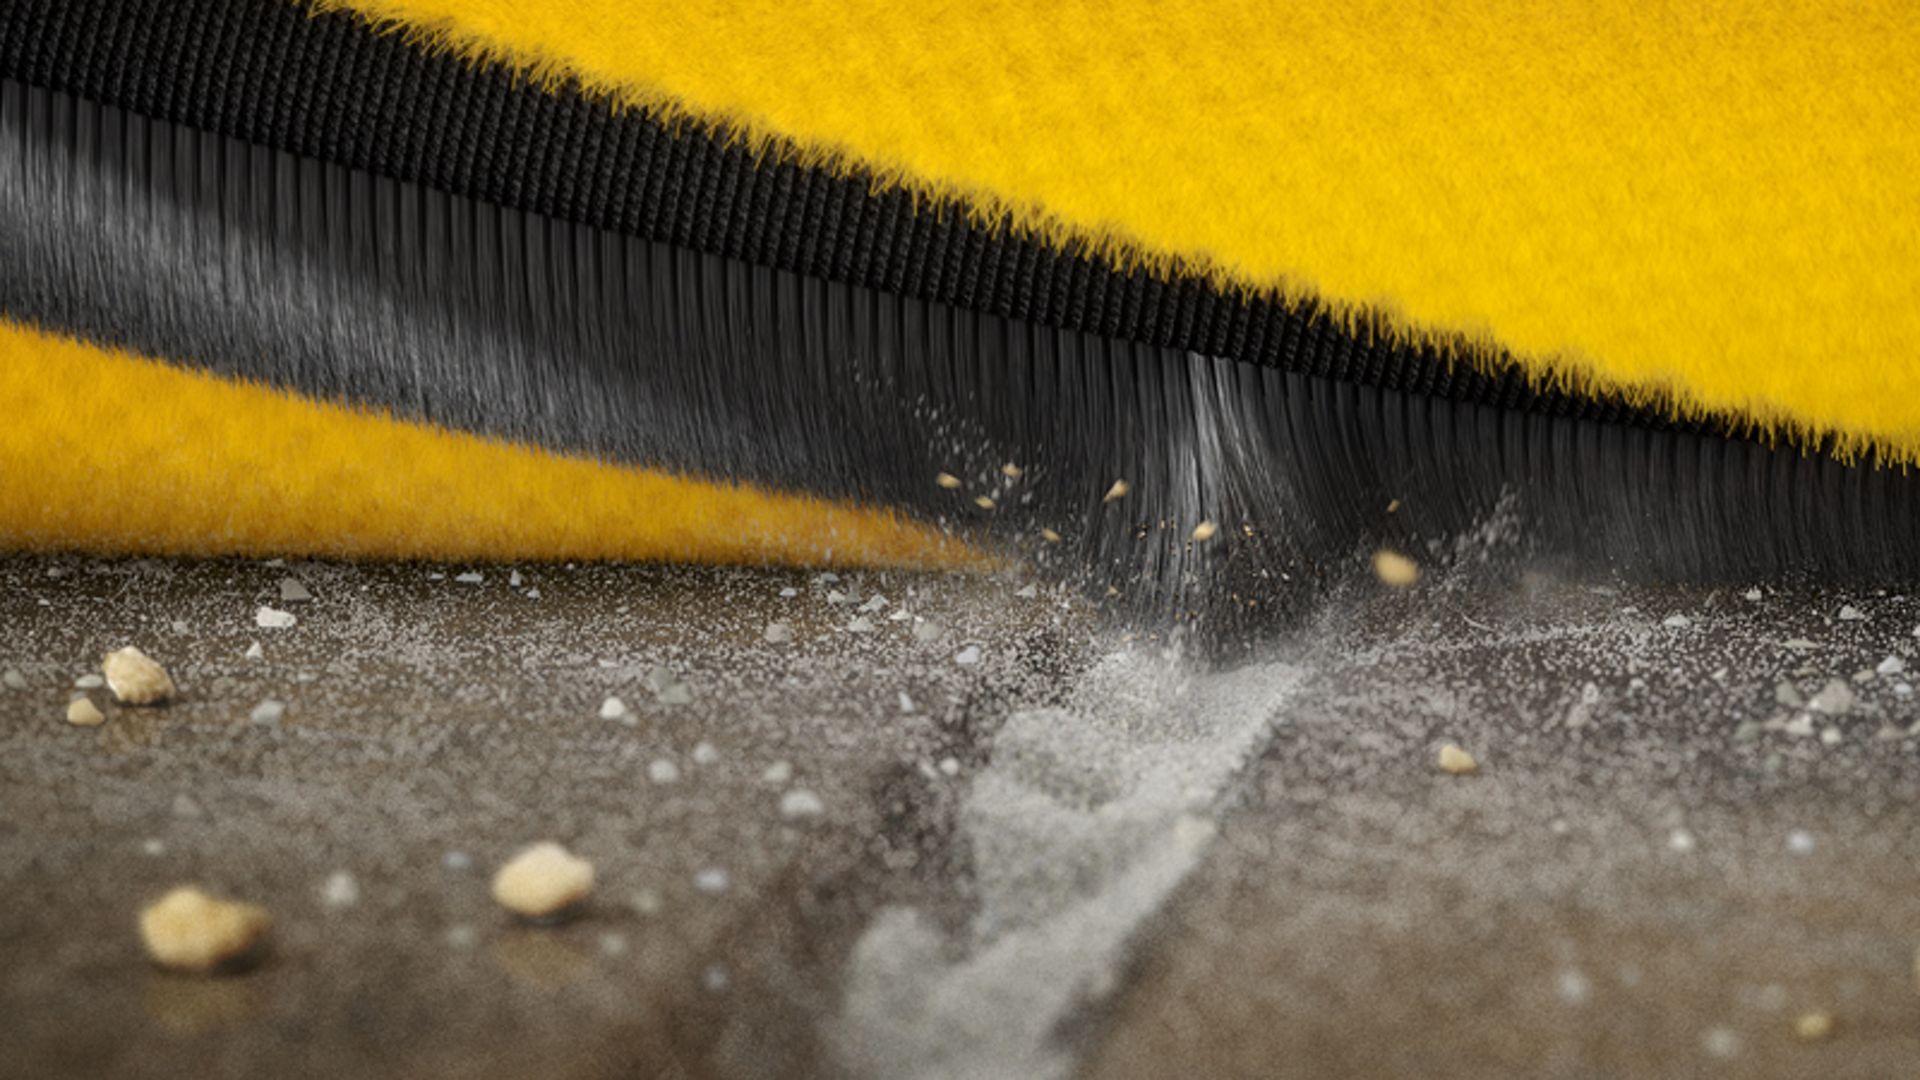 Carbon fiber filaments on Dyson's High Torque cleaner head brush bar